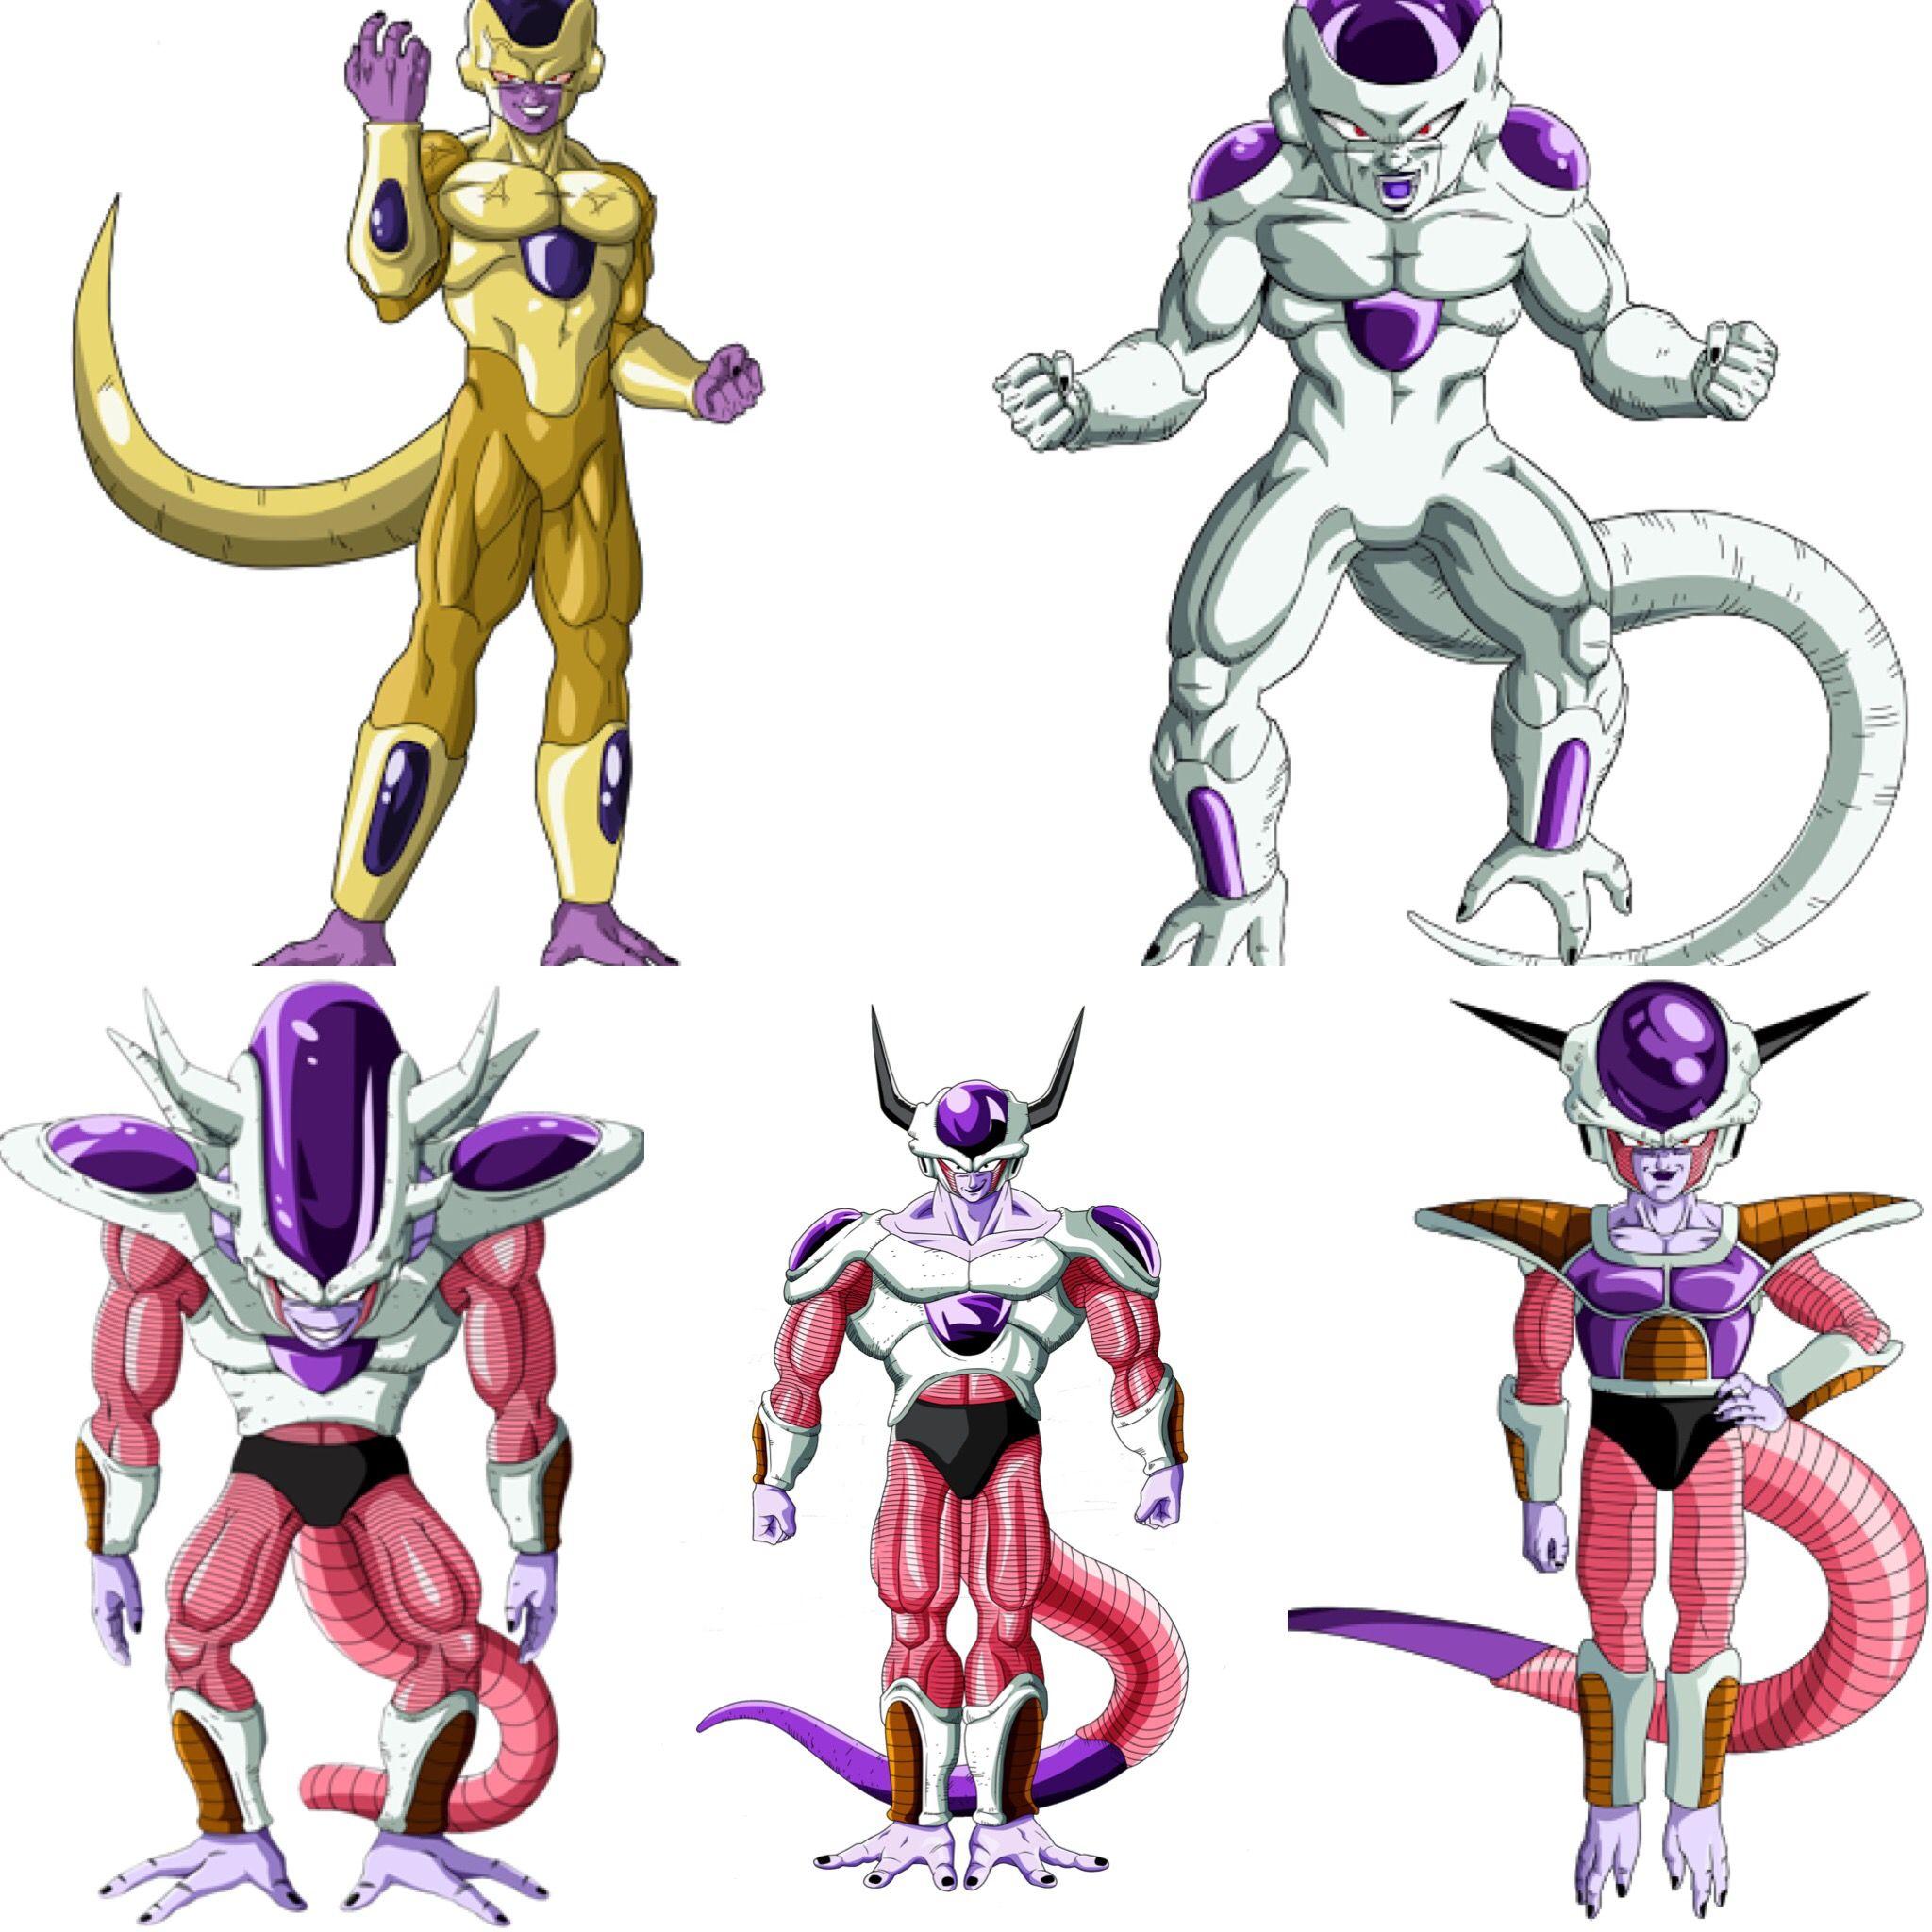 Frieza Forms Frieza Freeza Goldenfrieza Dbz Dbs Dragonballz Dragonballsuper Dragones Dragon Ball Dragon Ball Super